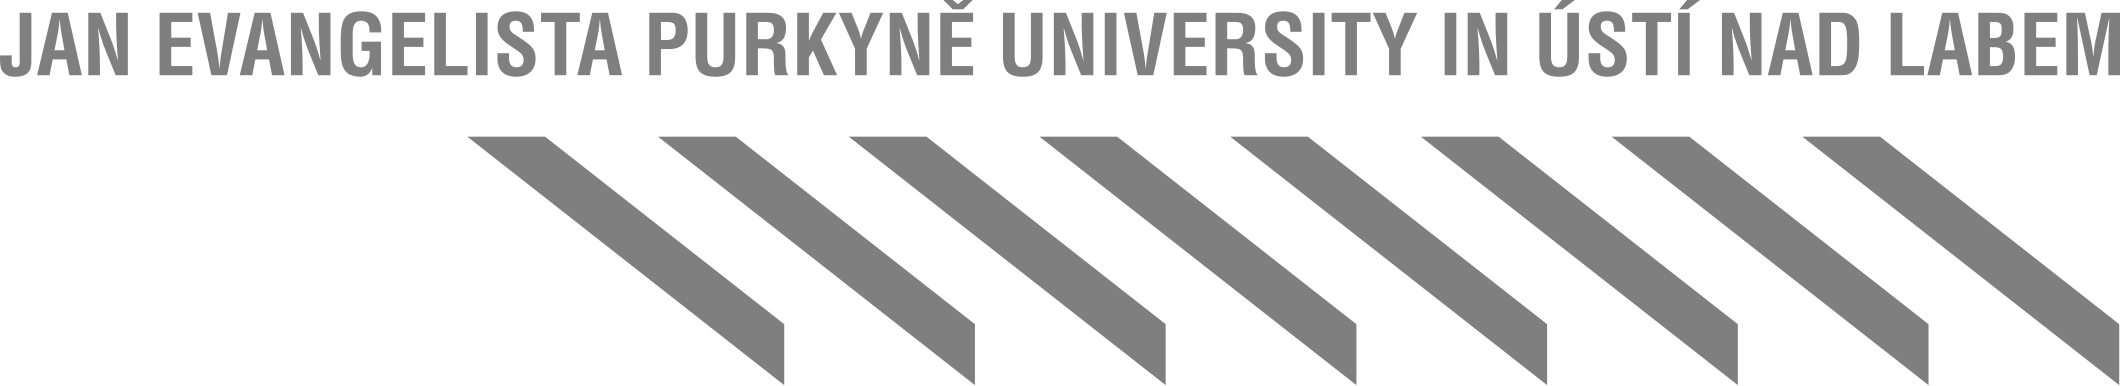 Jan Evangelista Purkyne university in Usti nad Labem